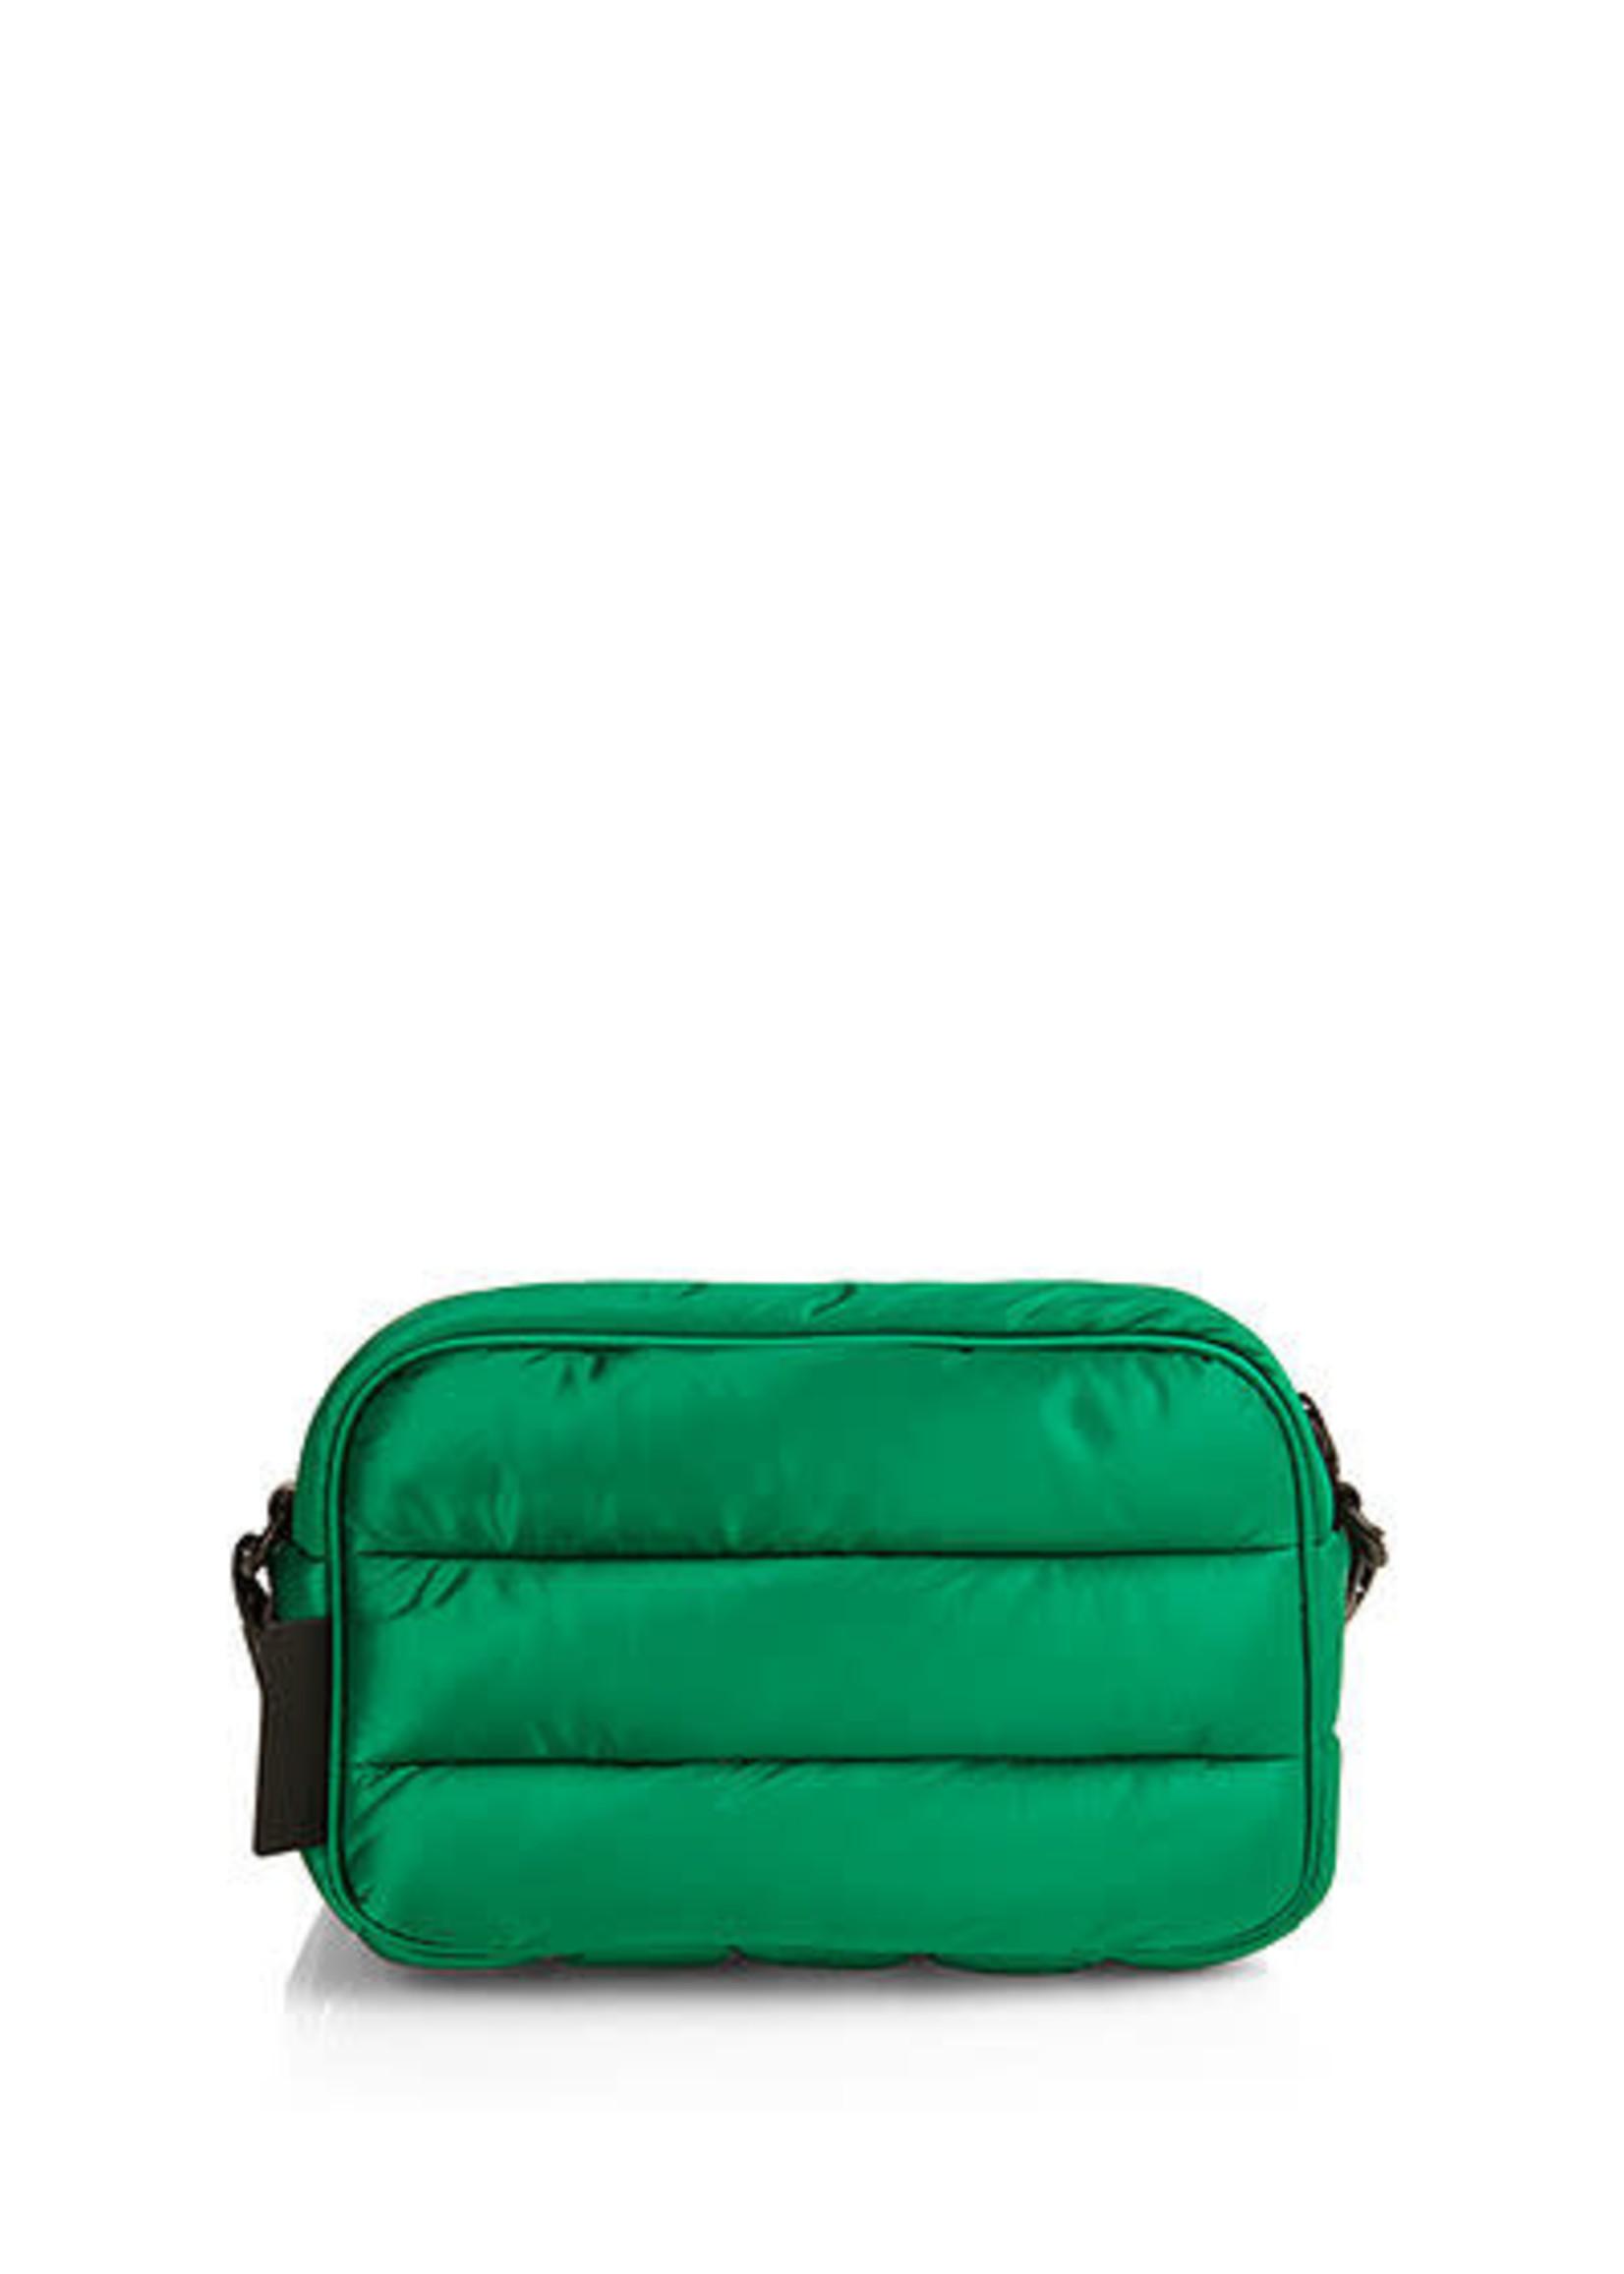 Marccain Bags & Shoes Shopper RB TI.12 W17 grass